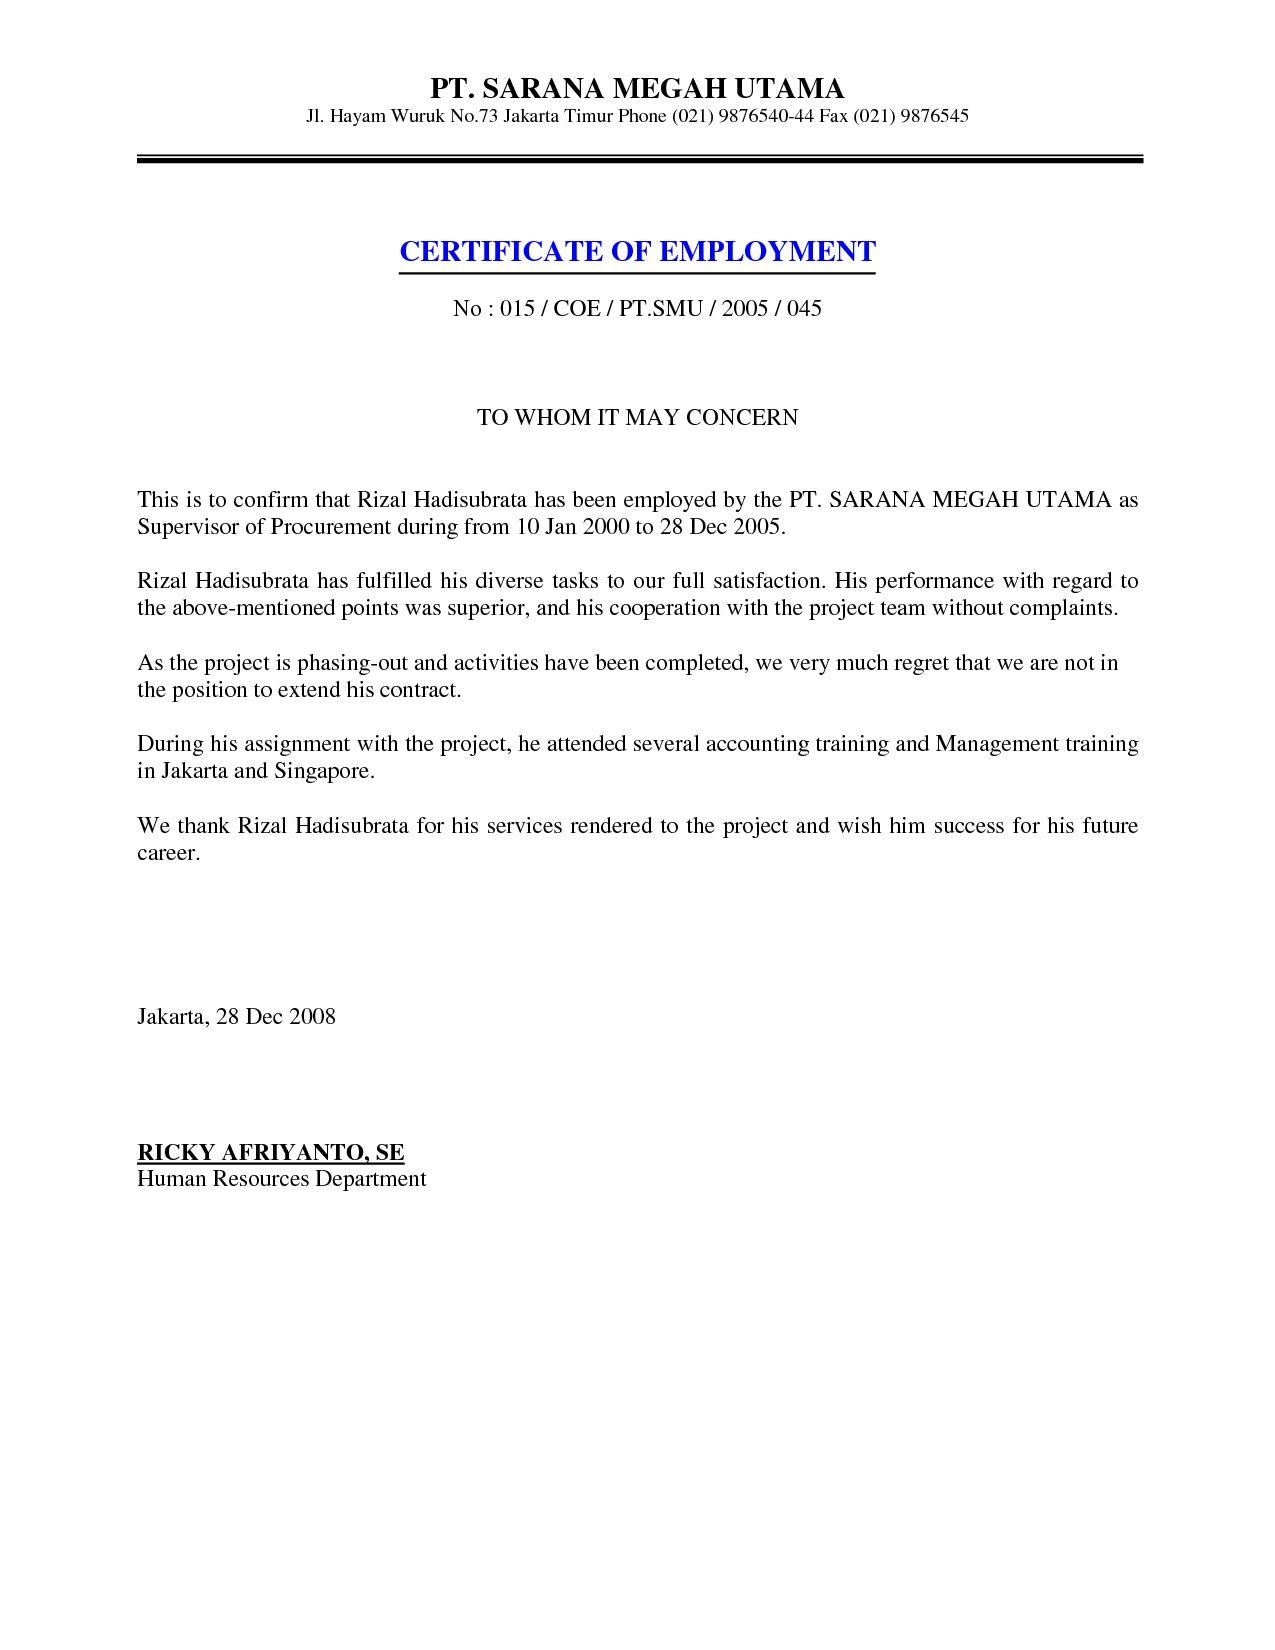 Job Employment Certificate Sample Certification Letter